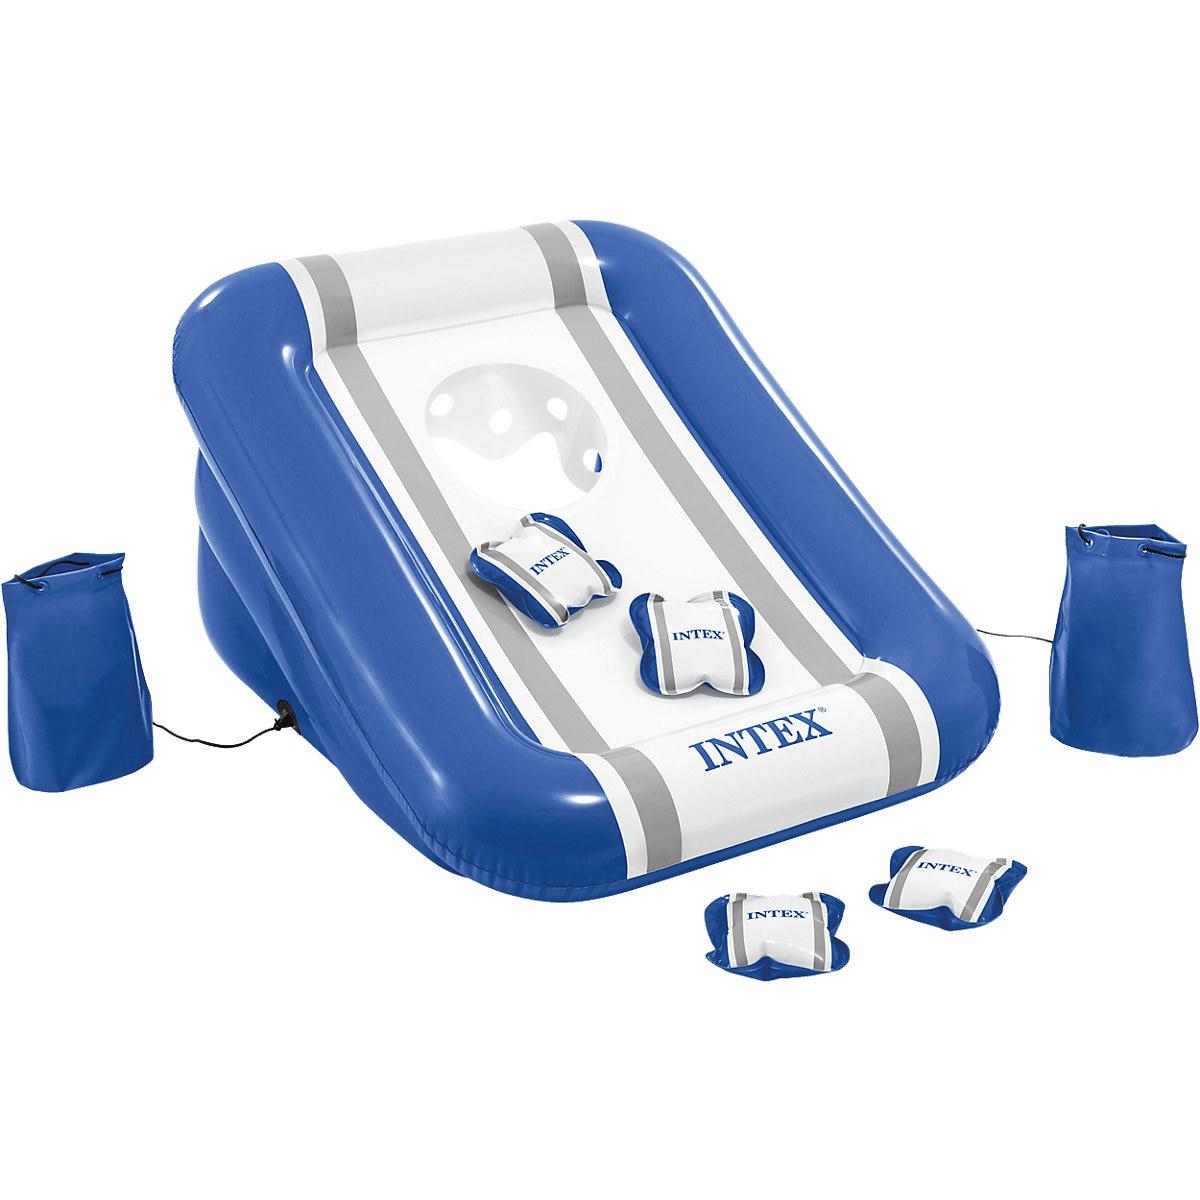 купить INTEX Inflatable Toys 7225931 games toy trampoline for children Kids game MTpromo дешево